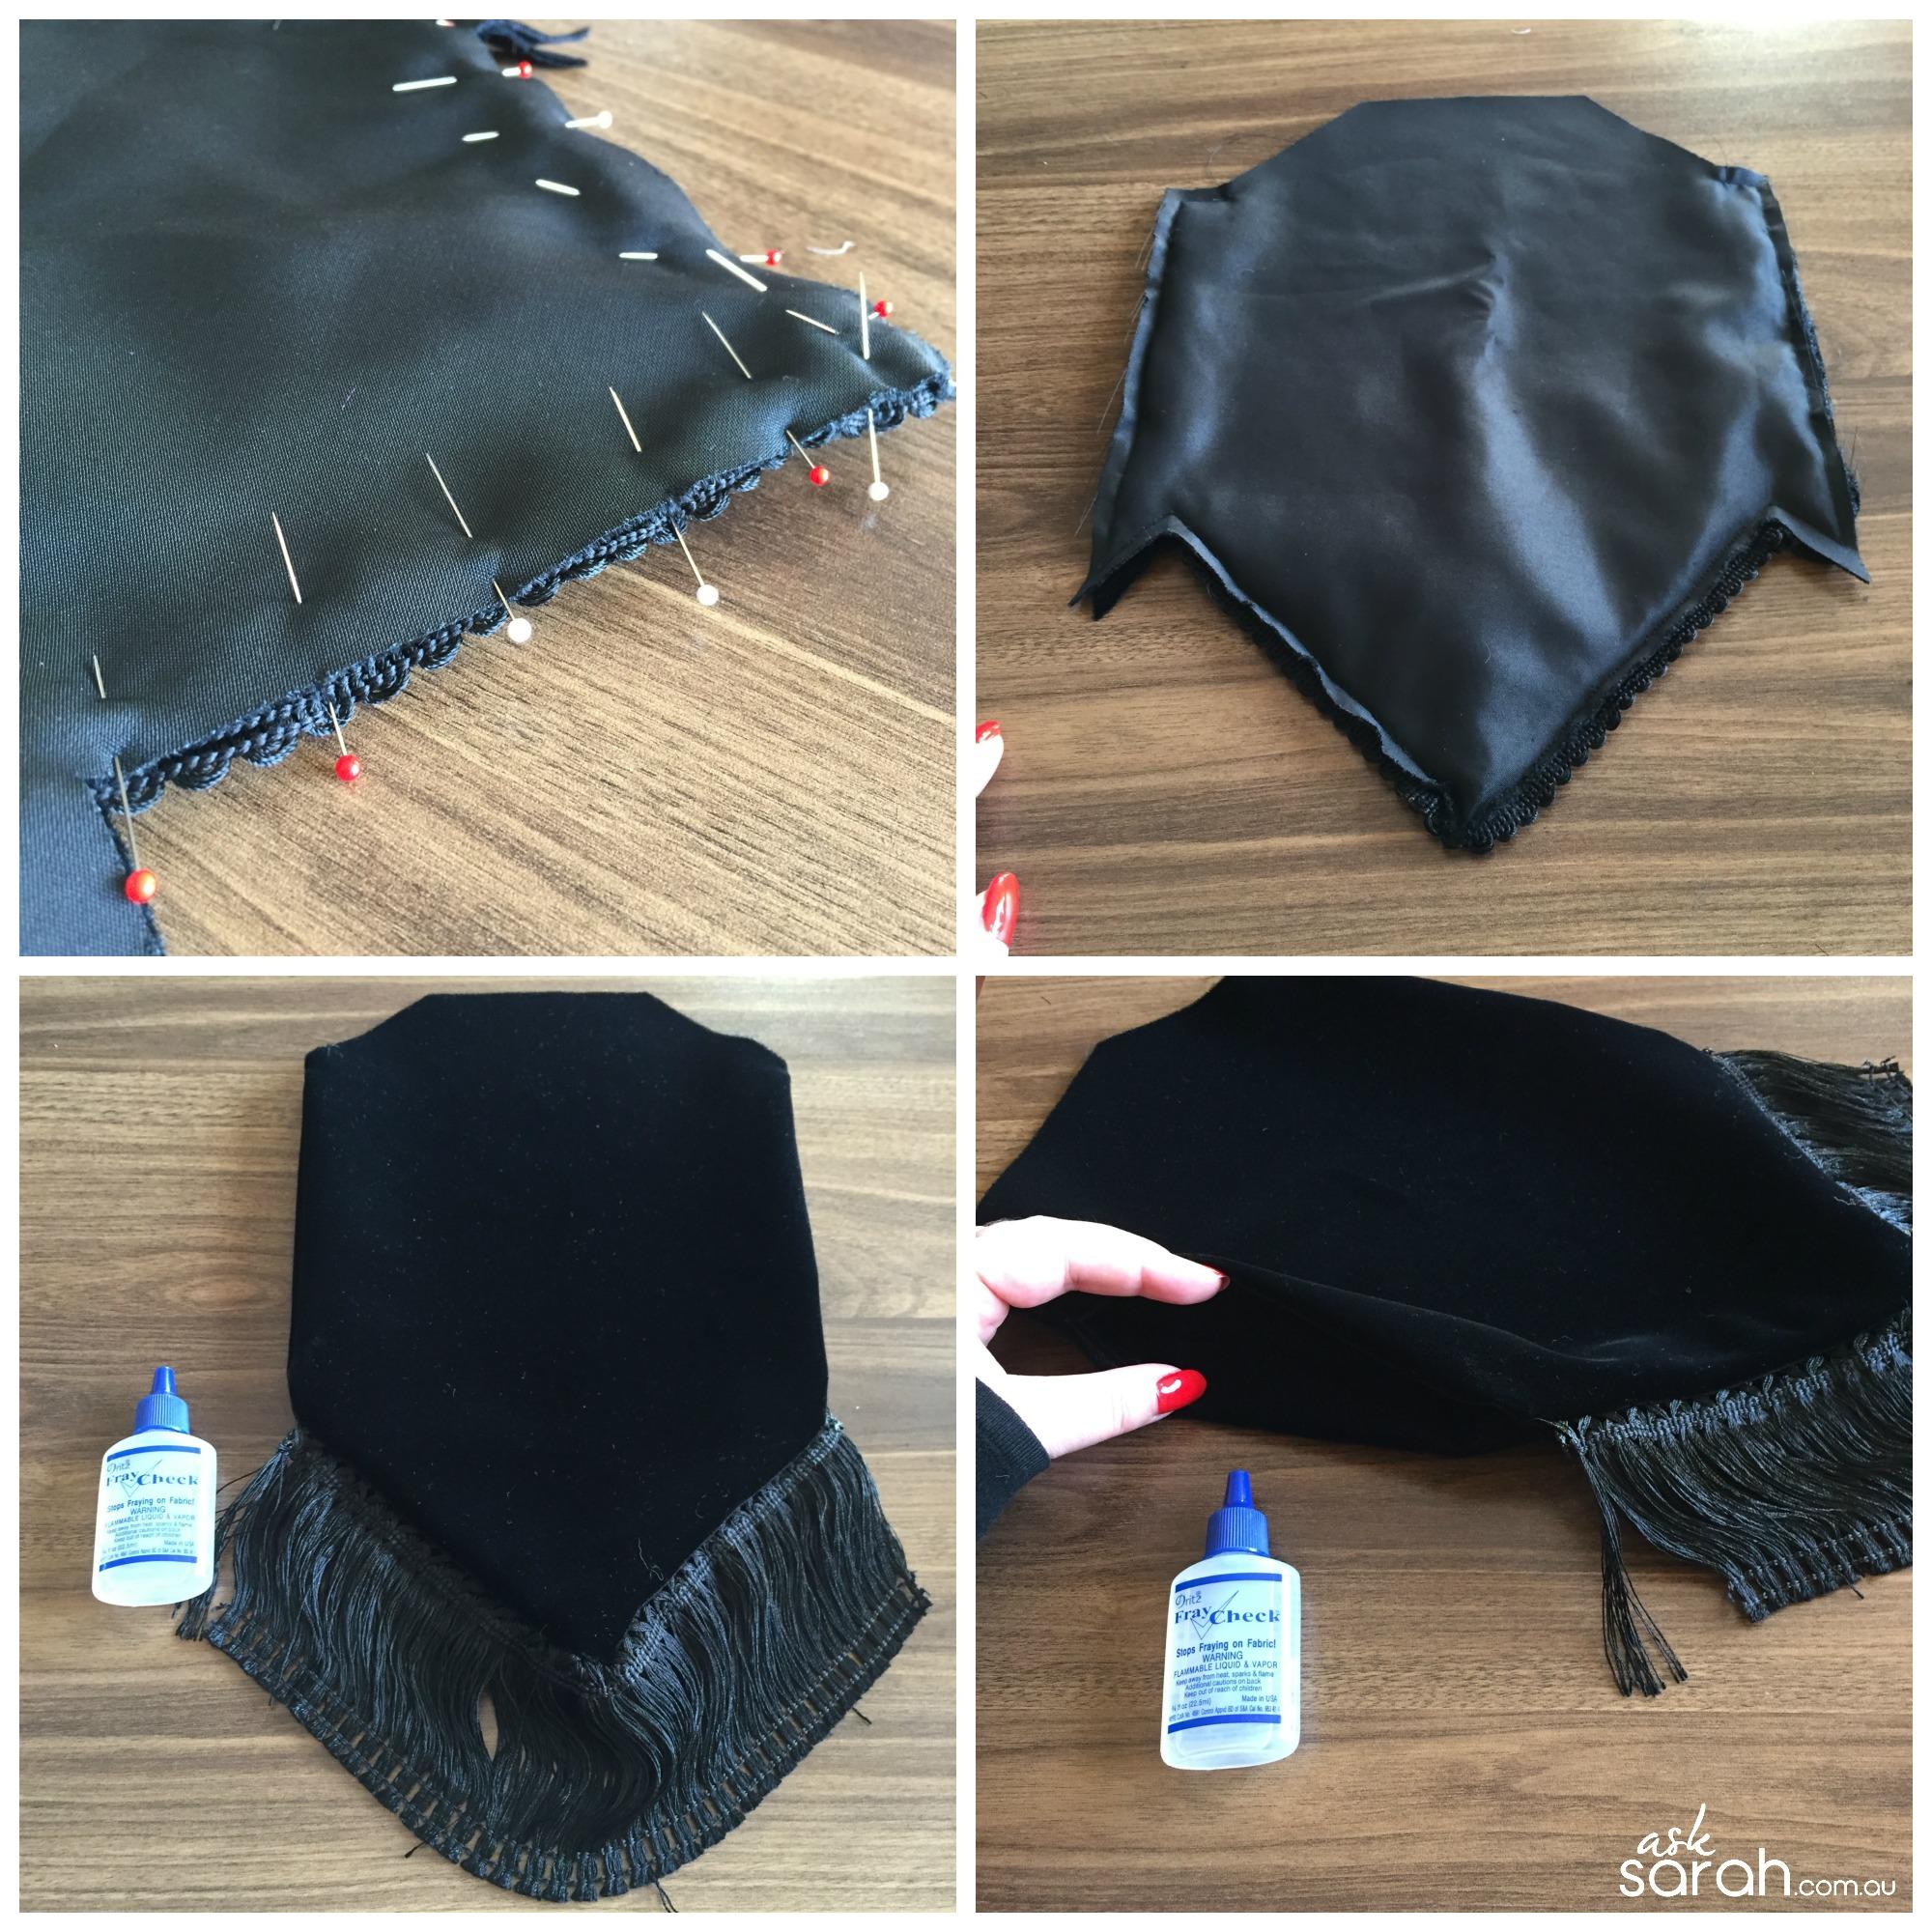 Sew: Vintage Inspired Velvet Evening Bag Tutorial {Just like the Tardis, its Bigger On The Inside!}